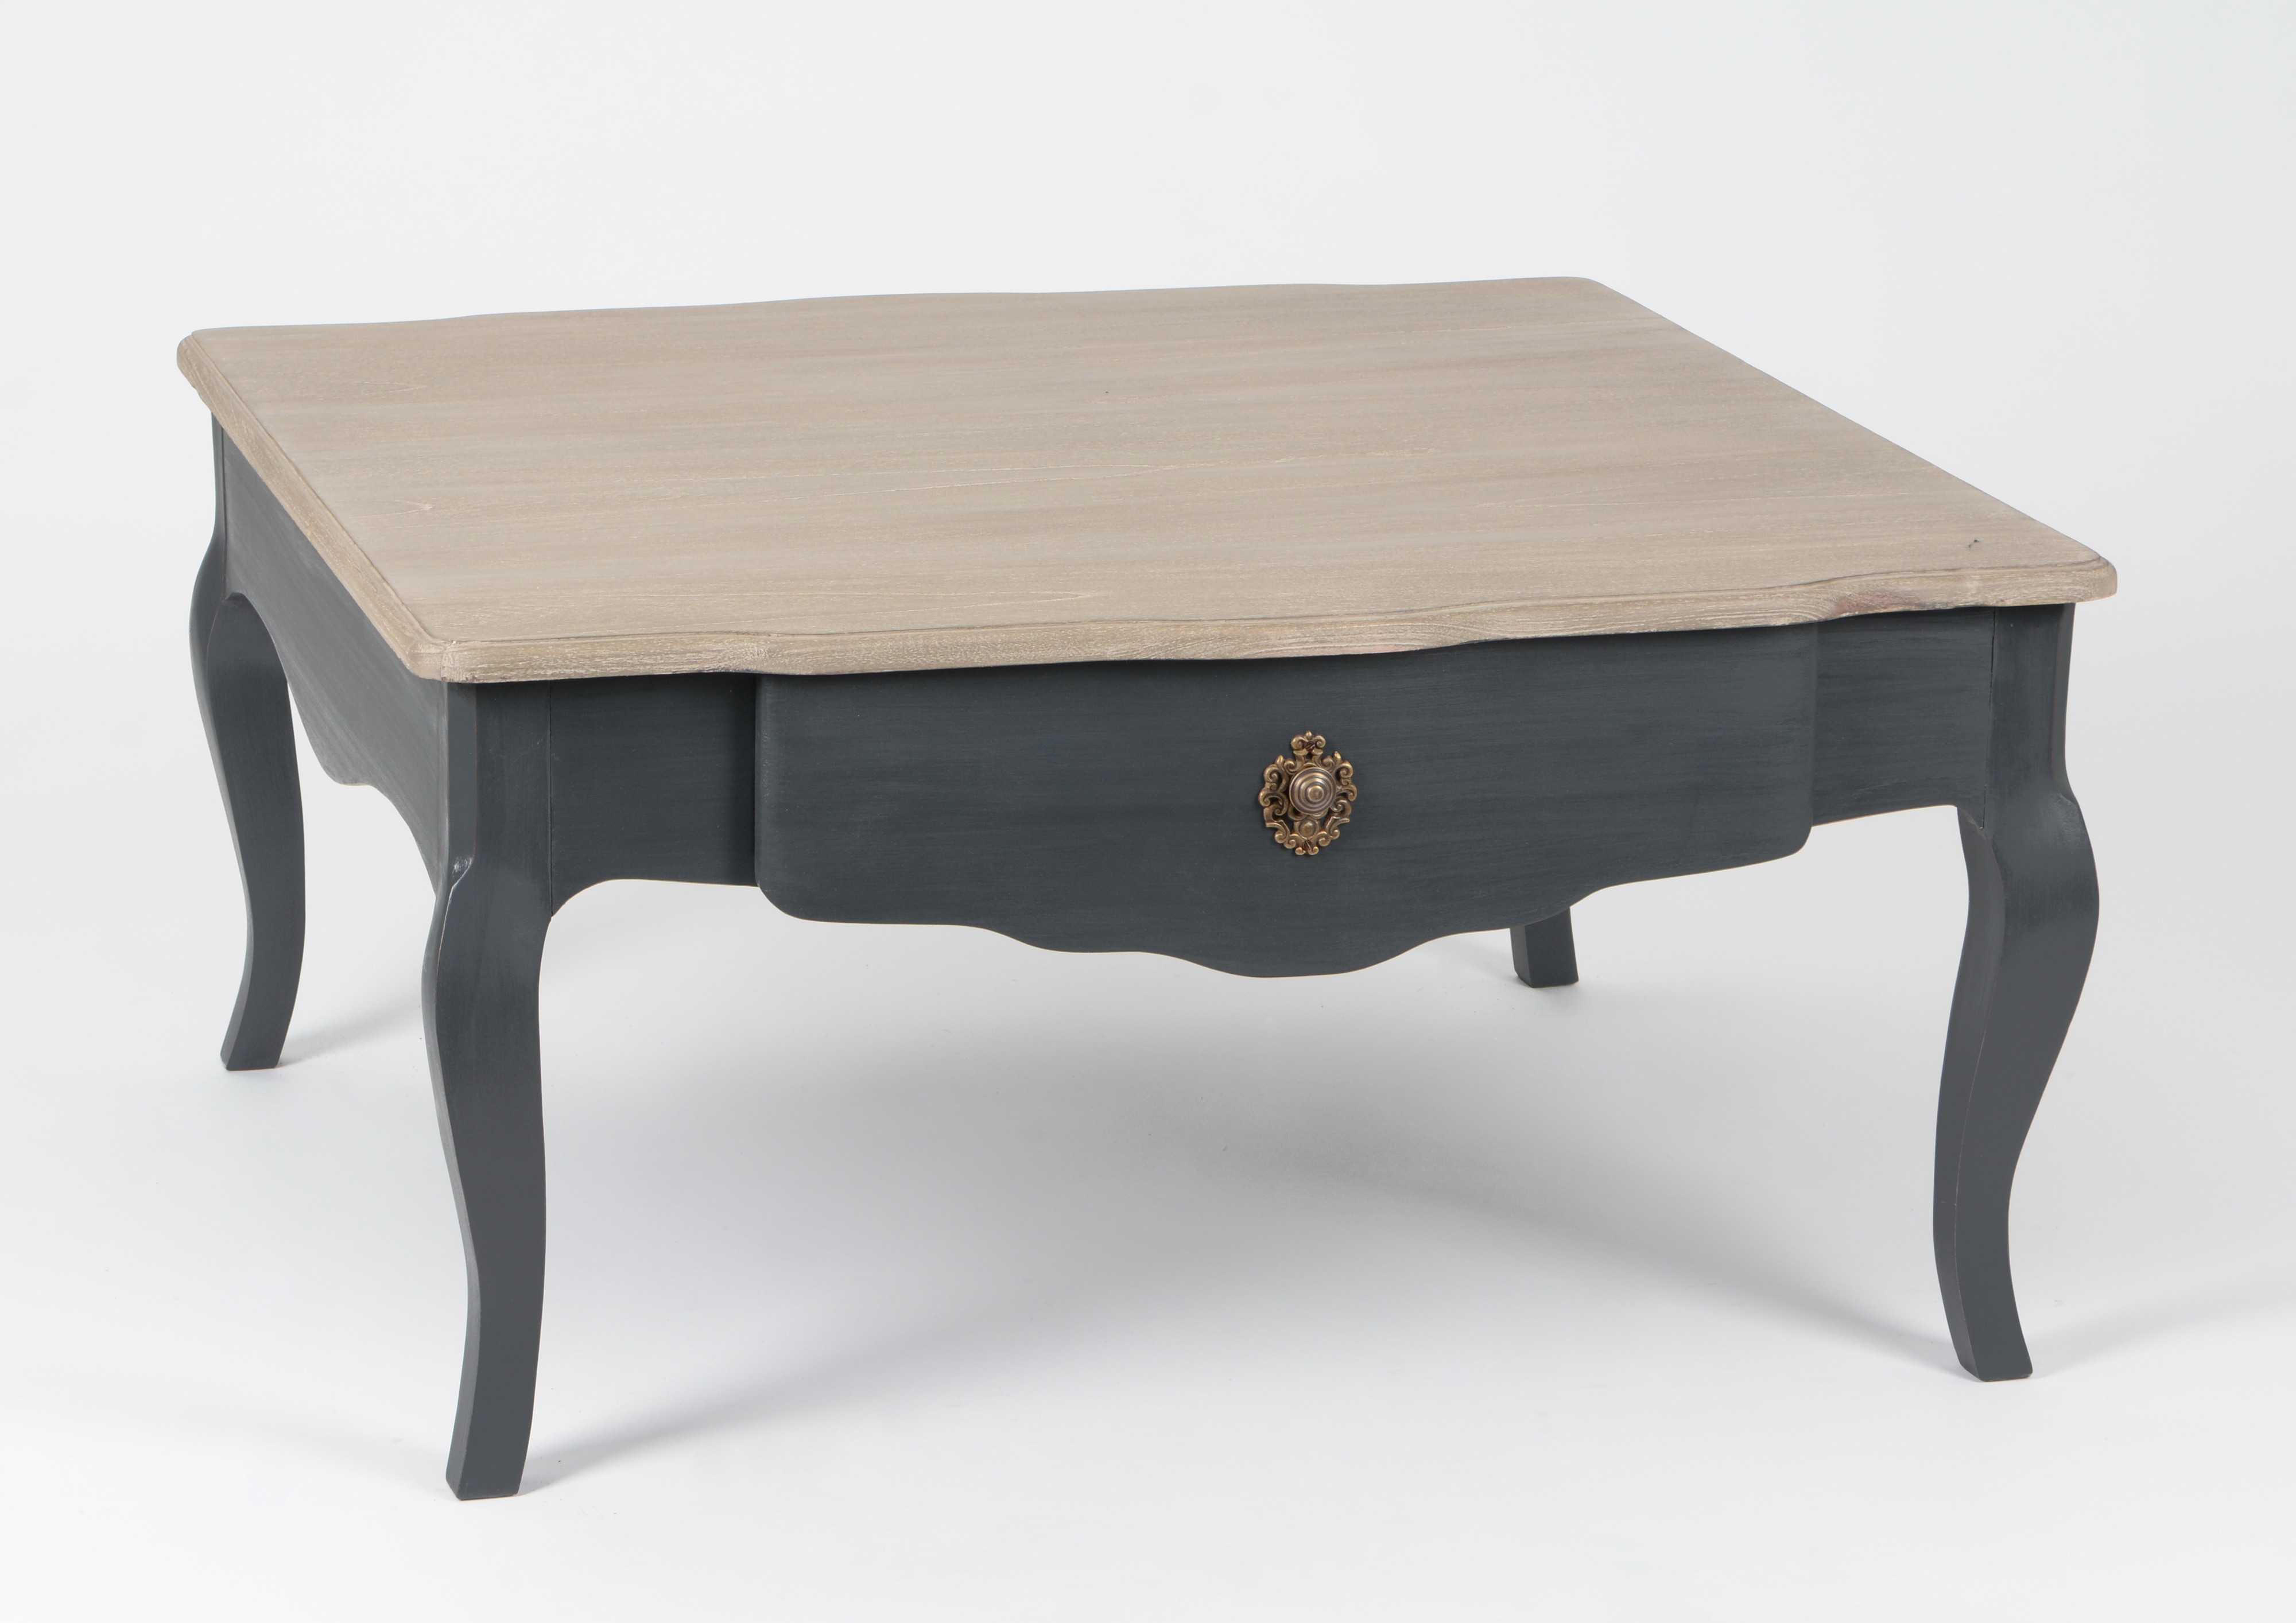 Table basse Baroque 1 tiroir CELESTINE ARDOISE plateau bois naturel  90x90x45cm AMADEUS